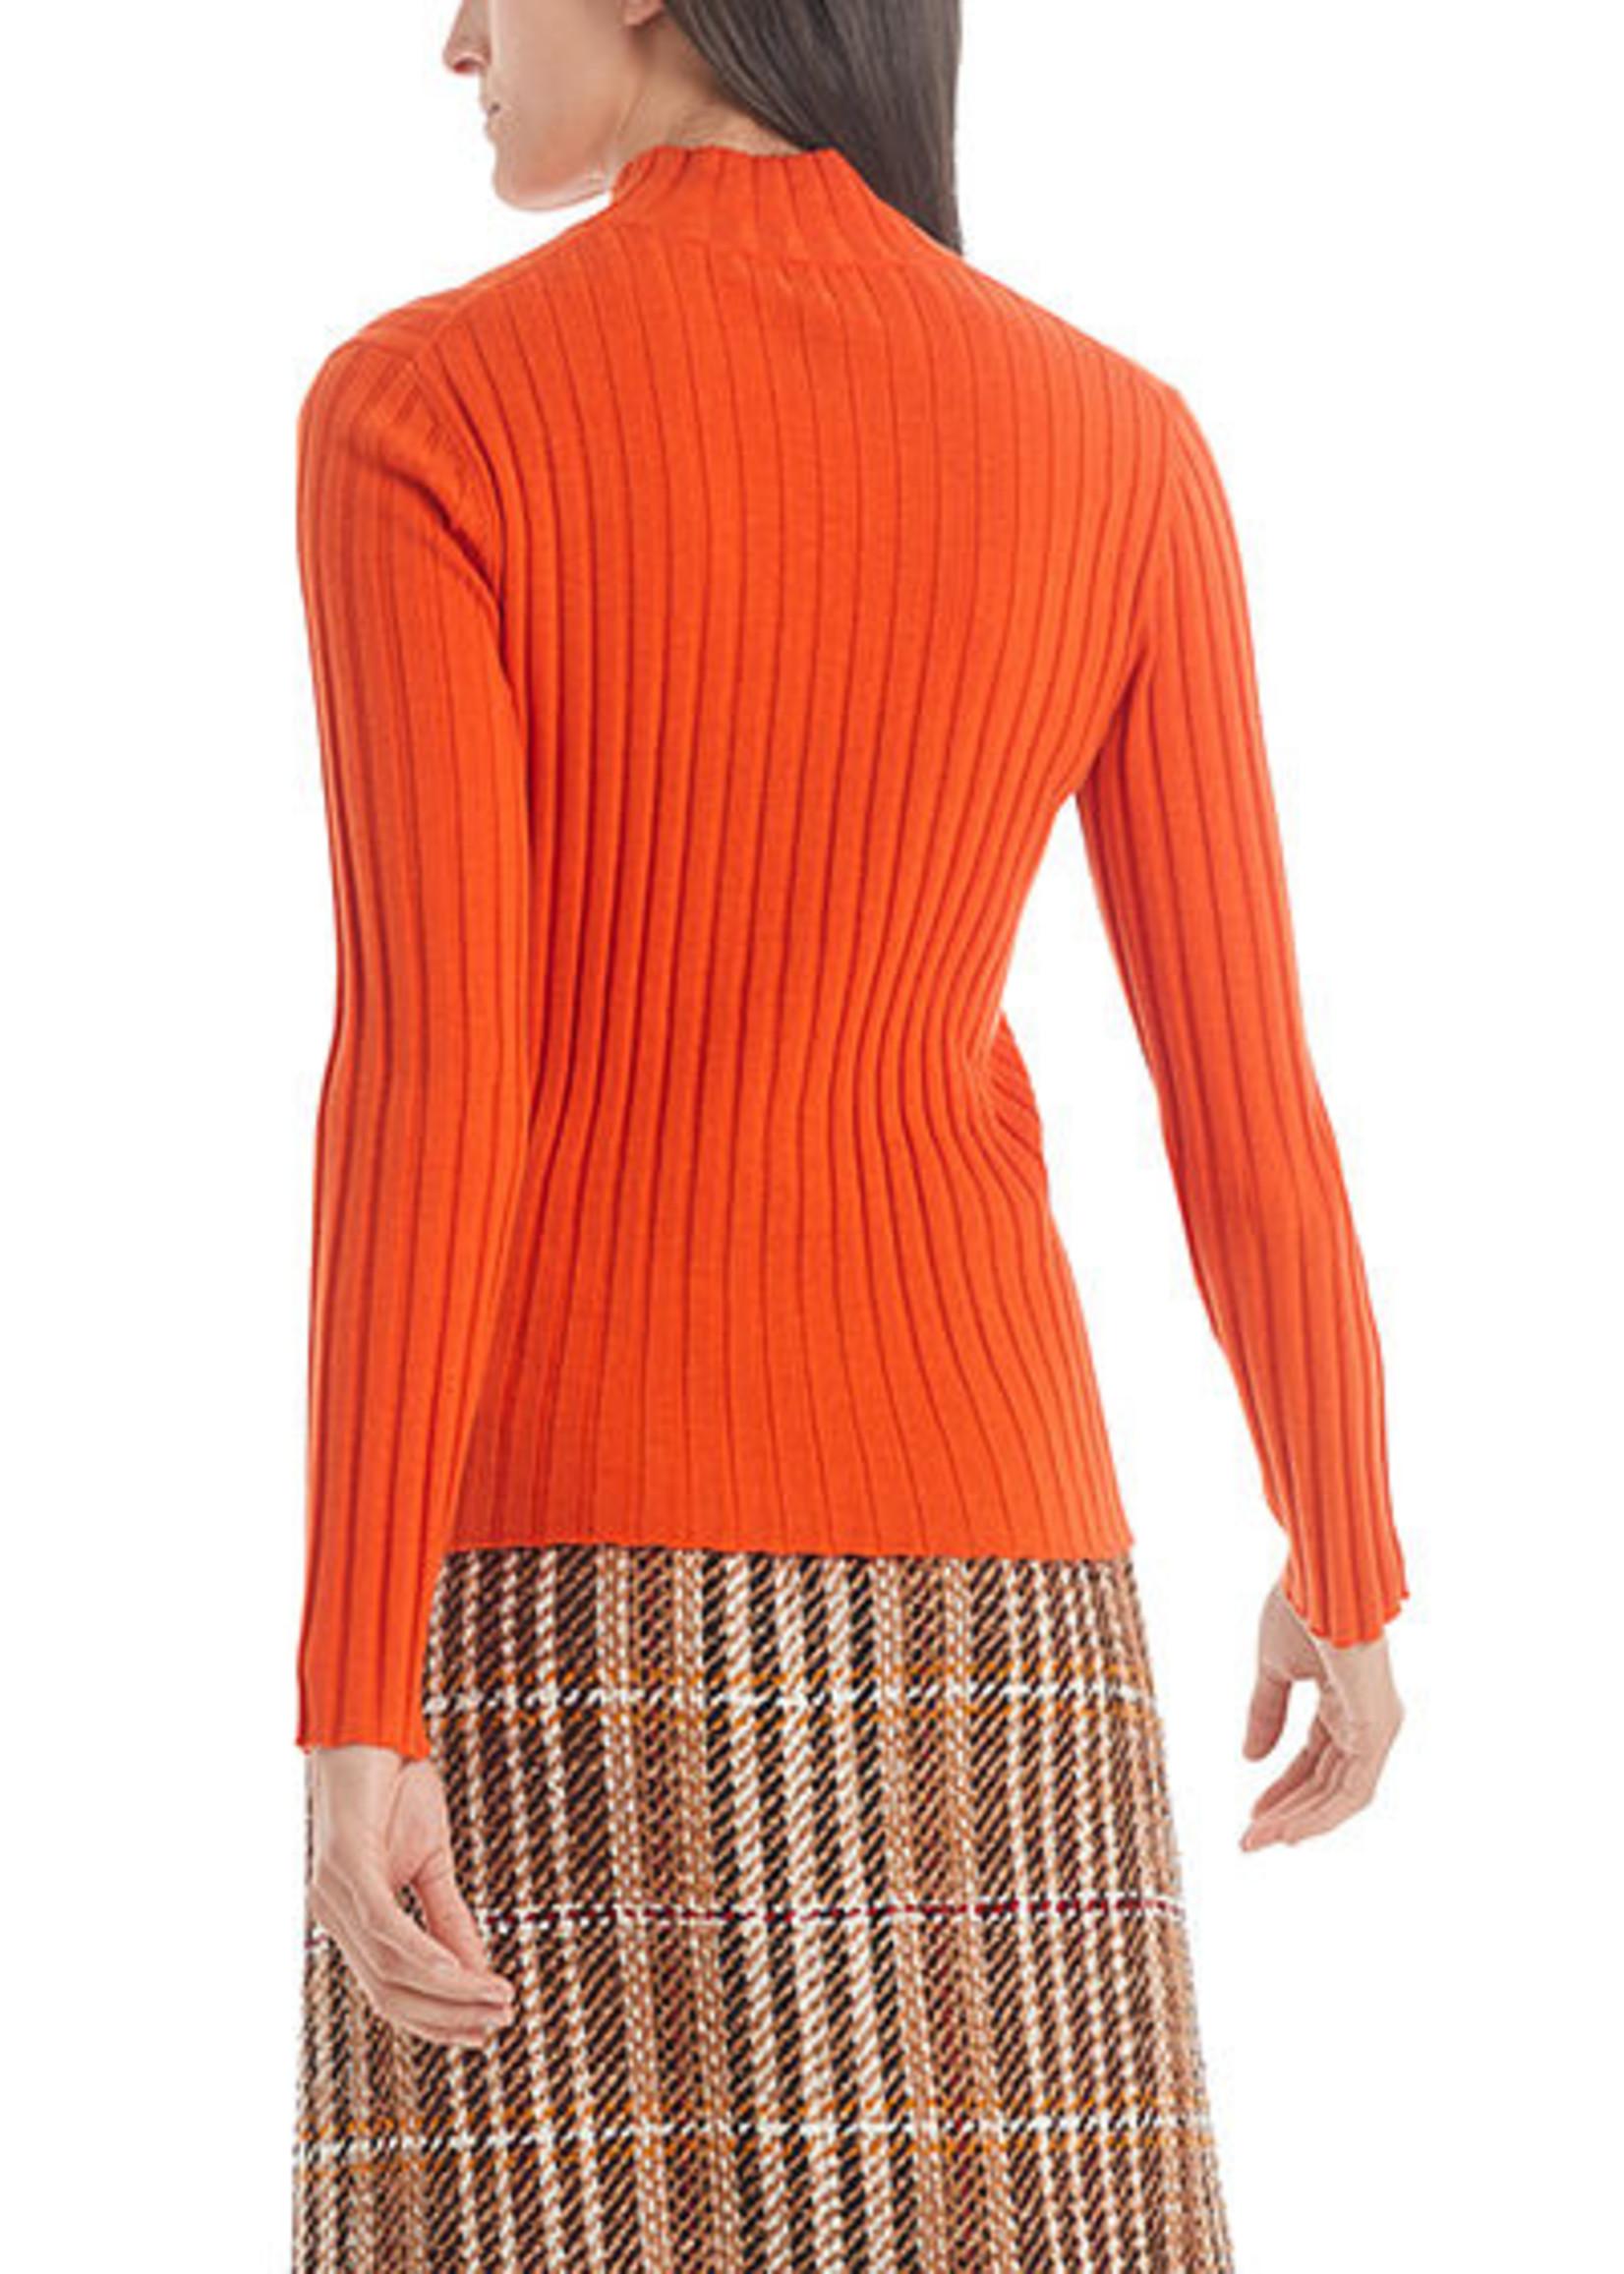 Sweater RC 41.50 M53 hokkaido